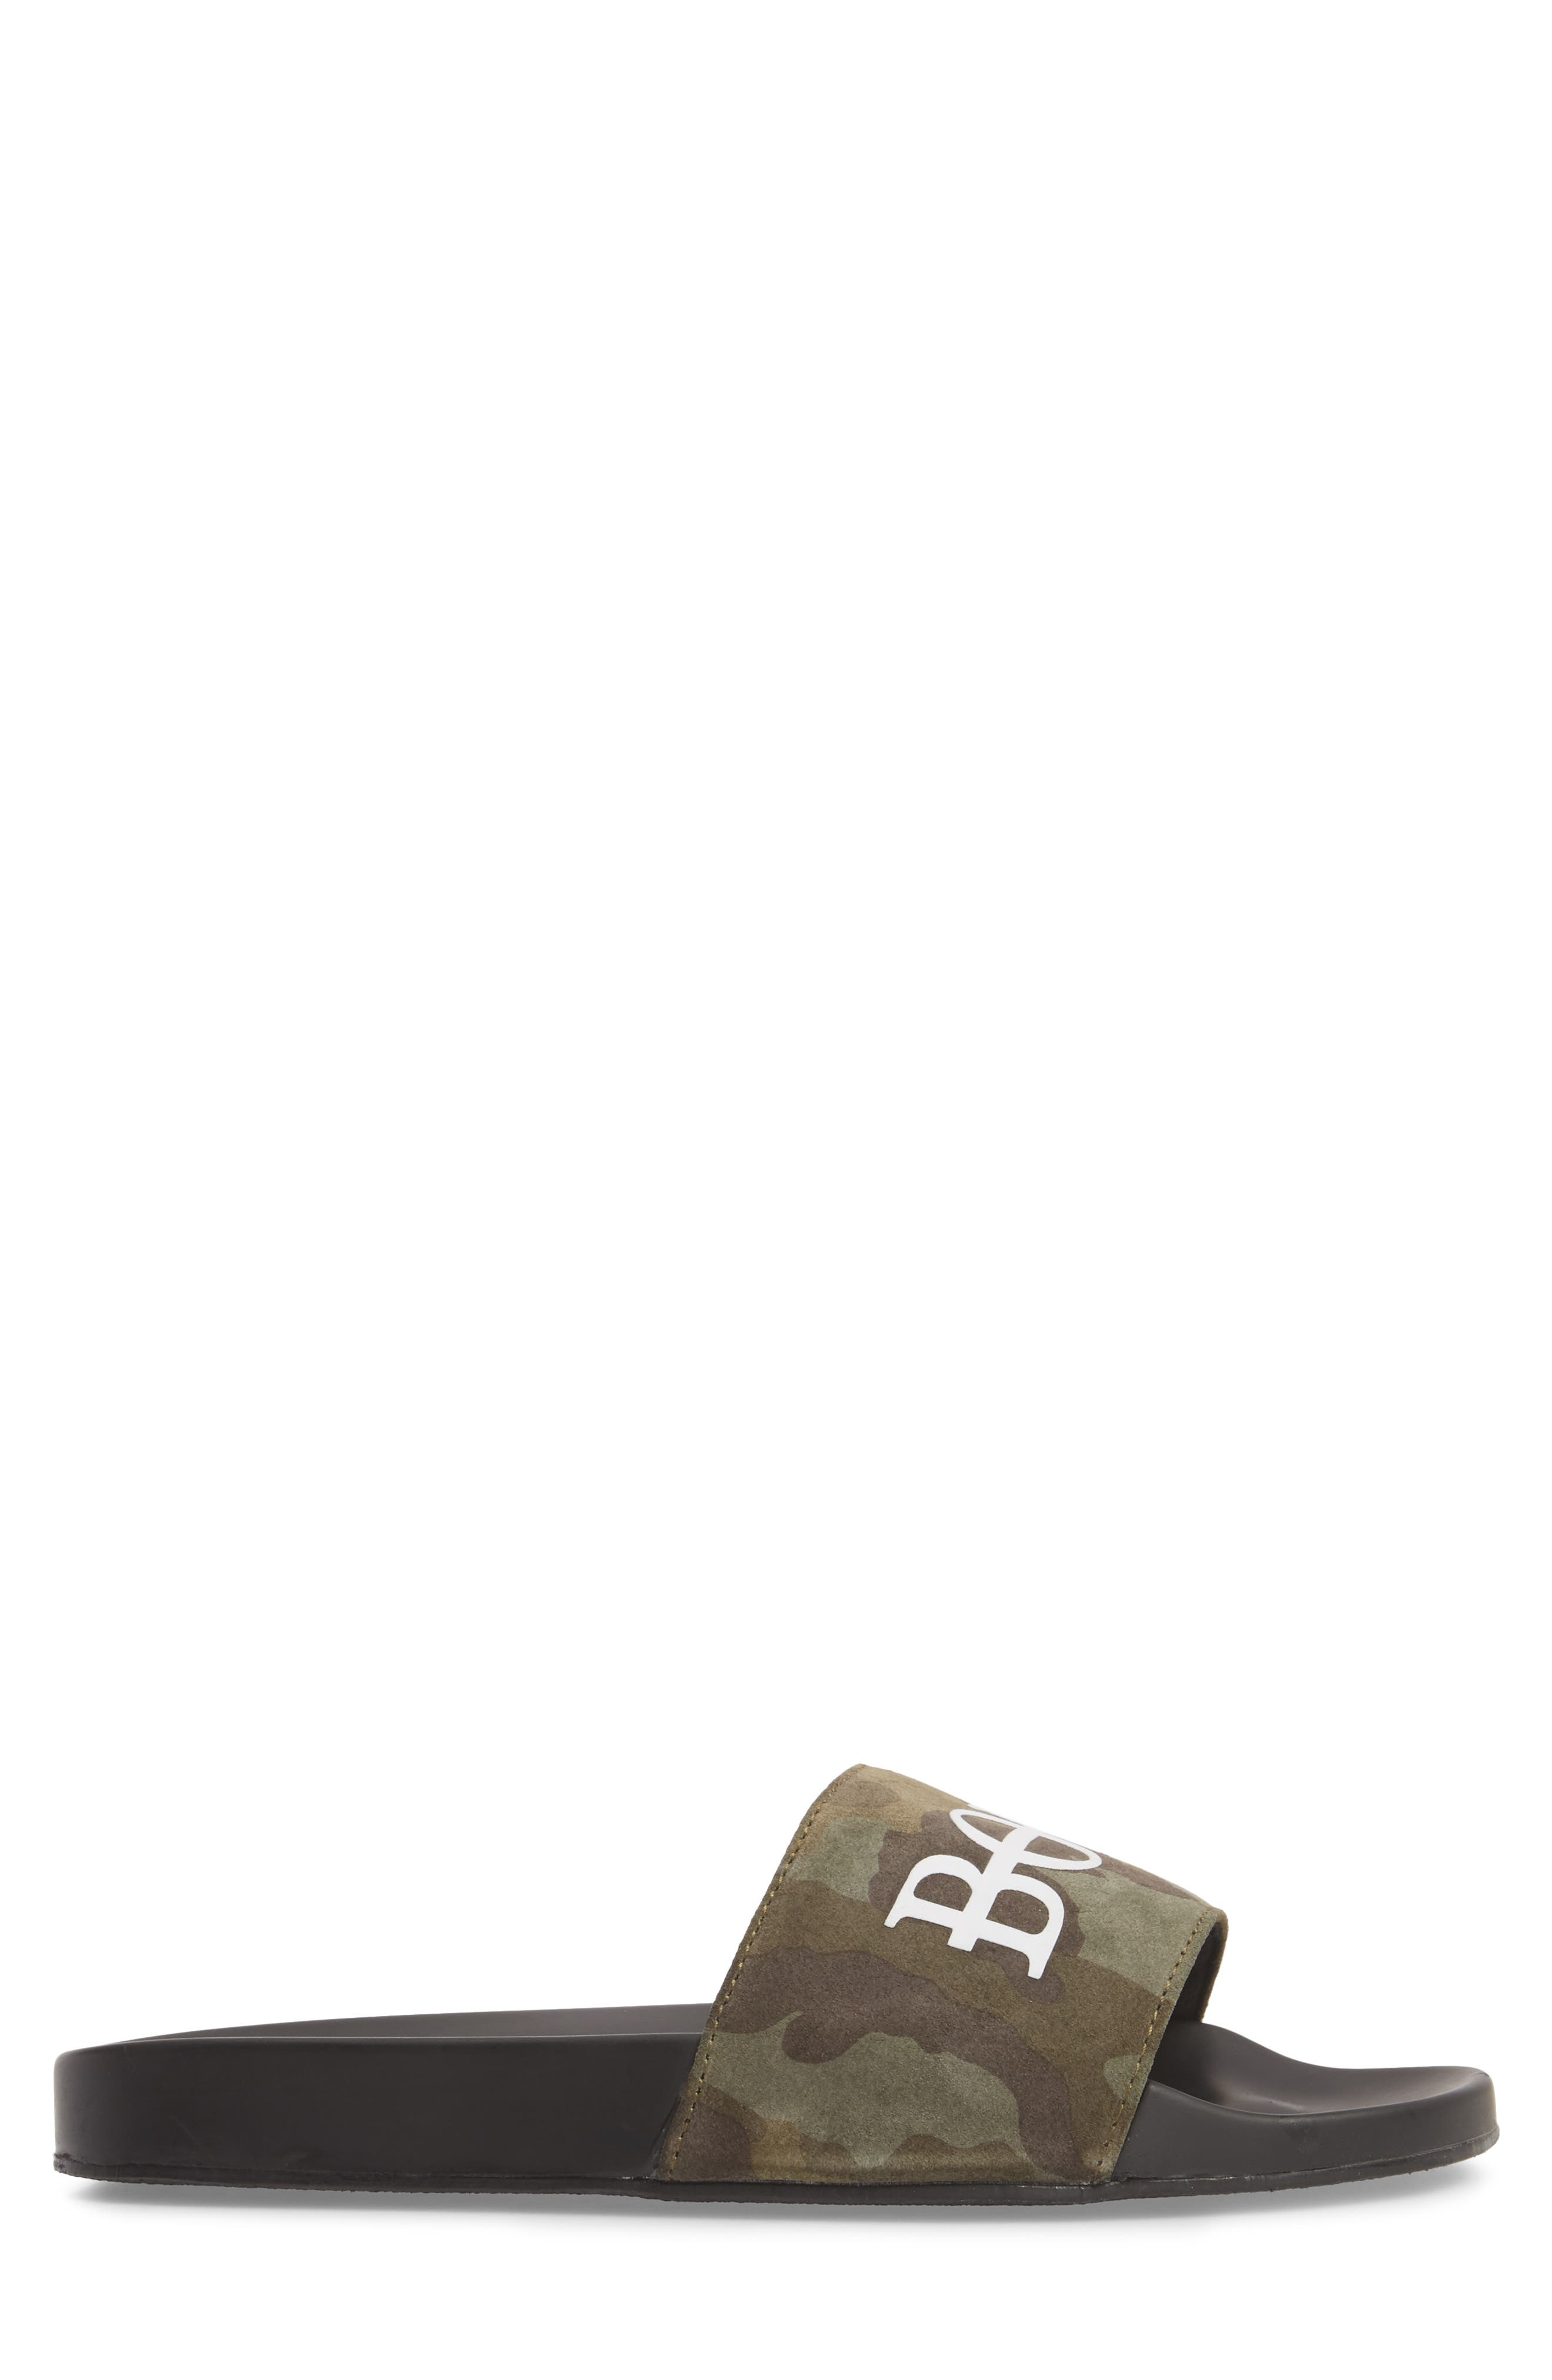 HB Sport Slide,                             Alternate thumbnail 3, color,                             Green Camo Suede